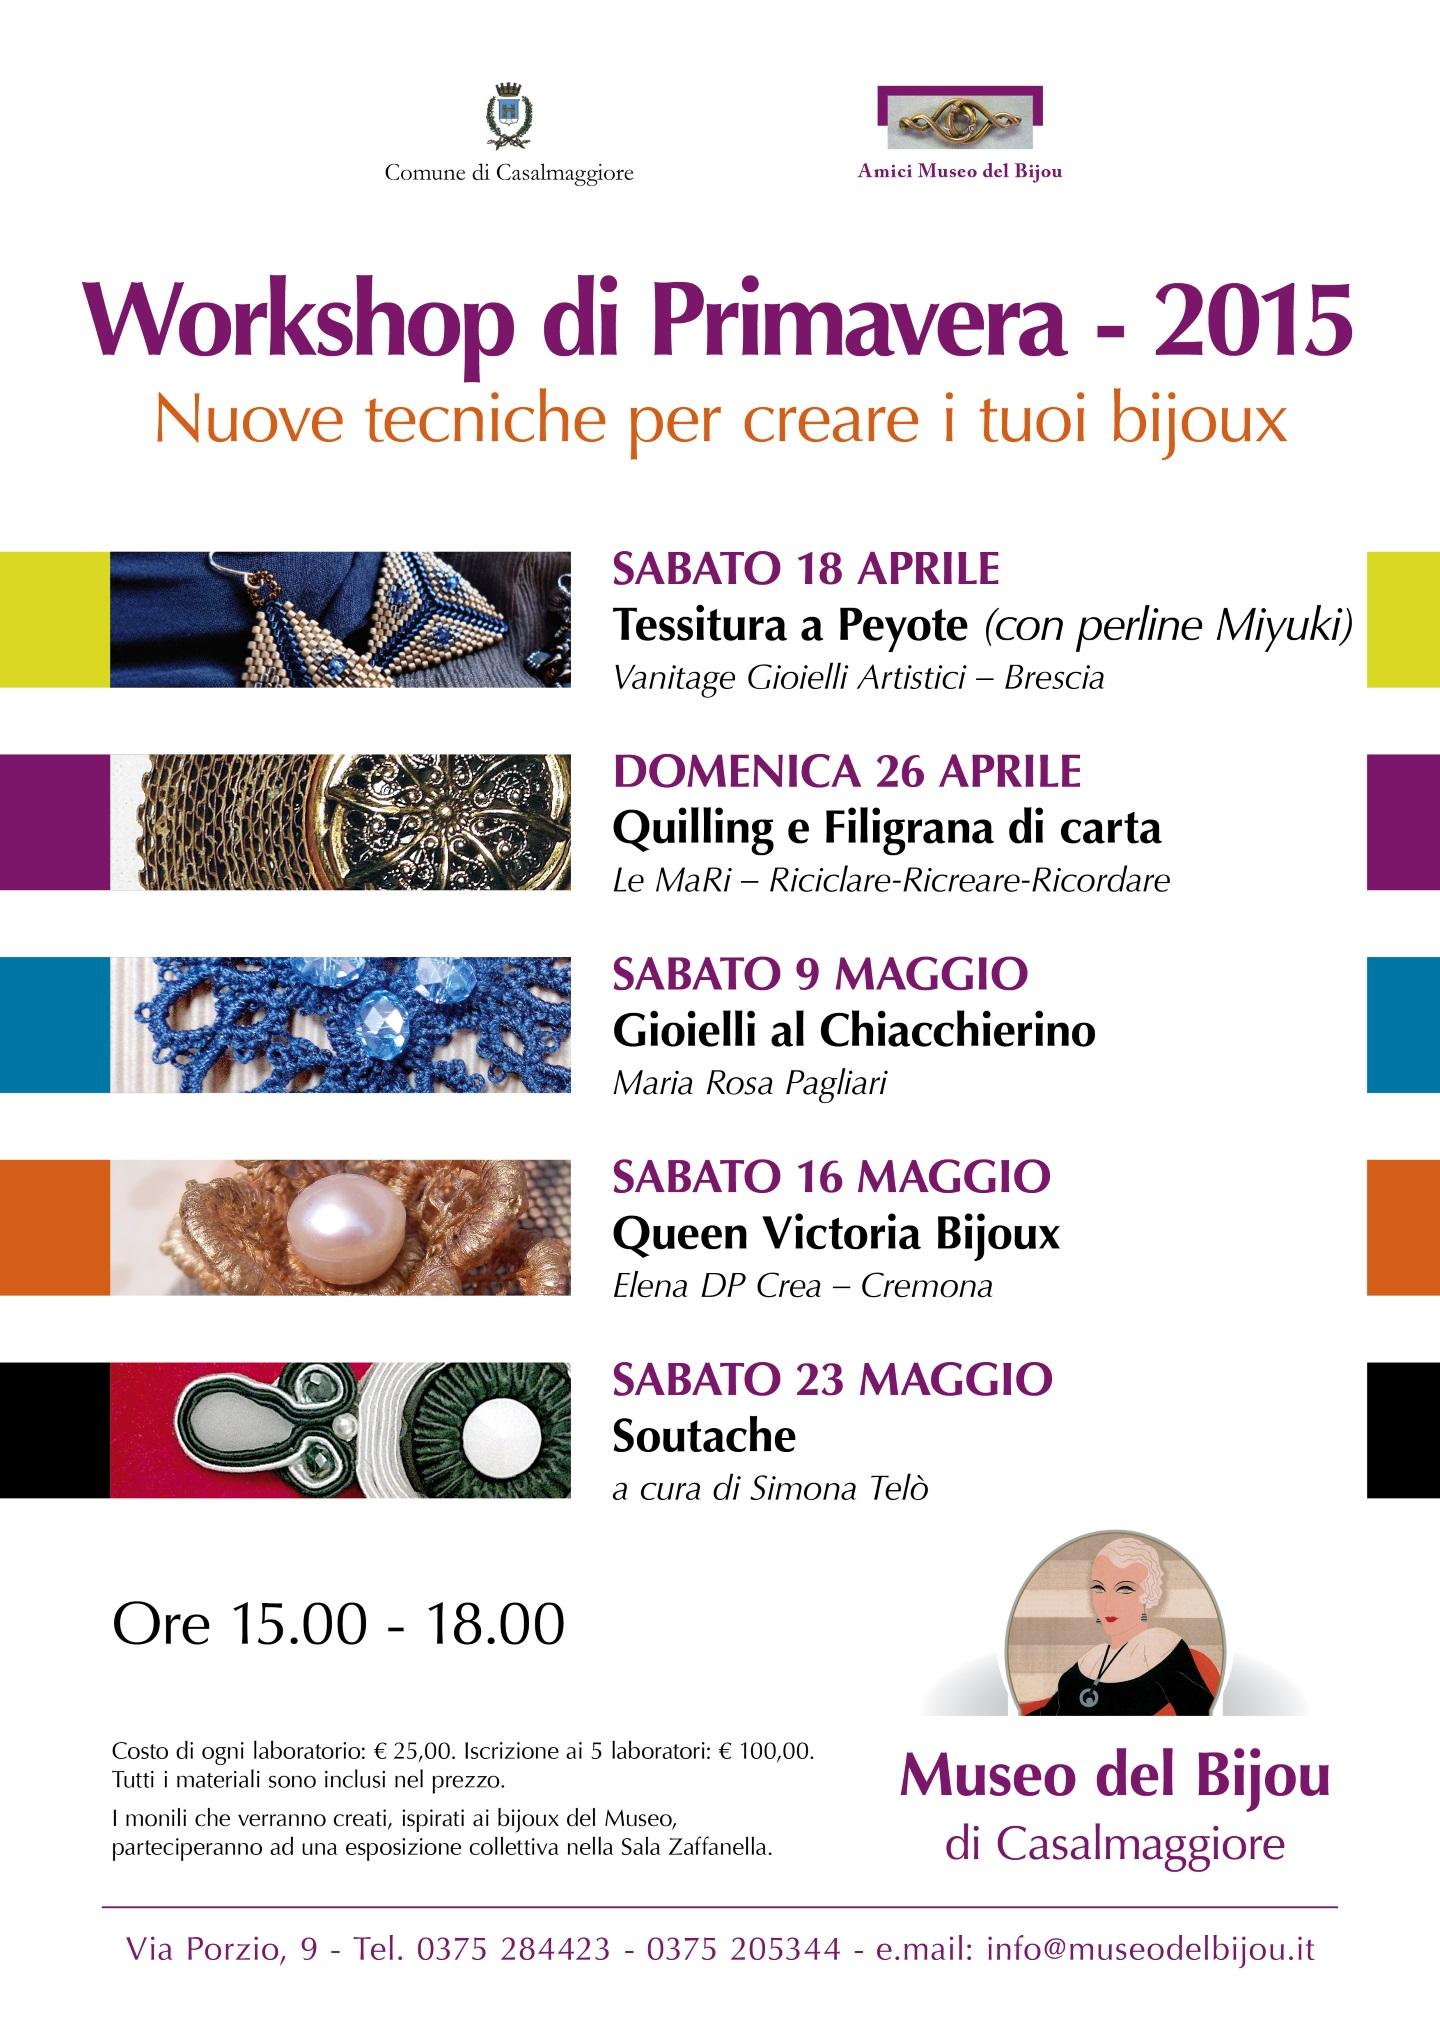 Workshop al Museo del Bijou!